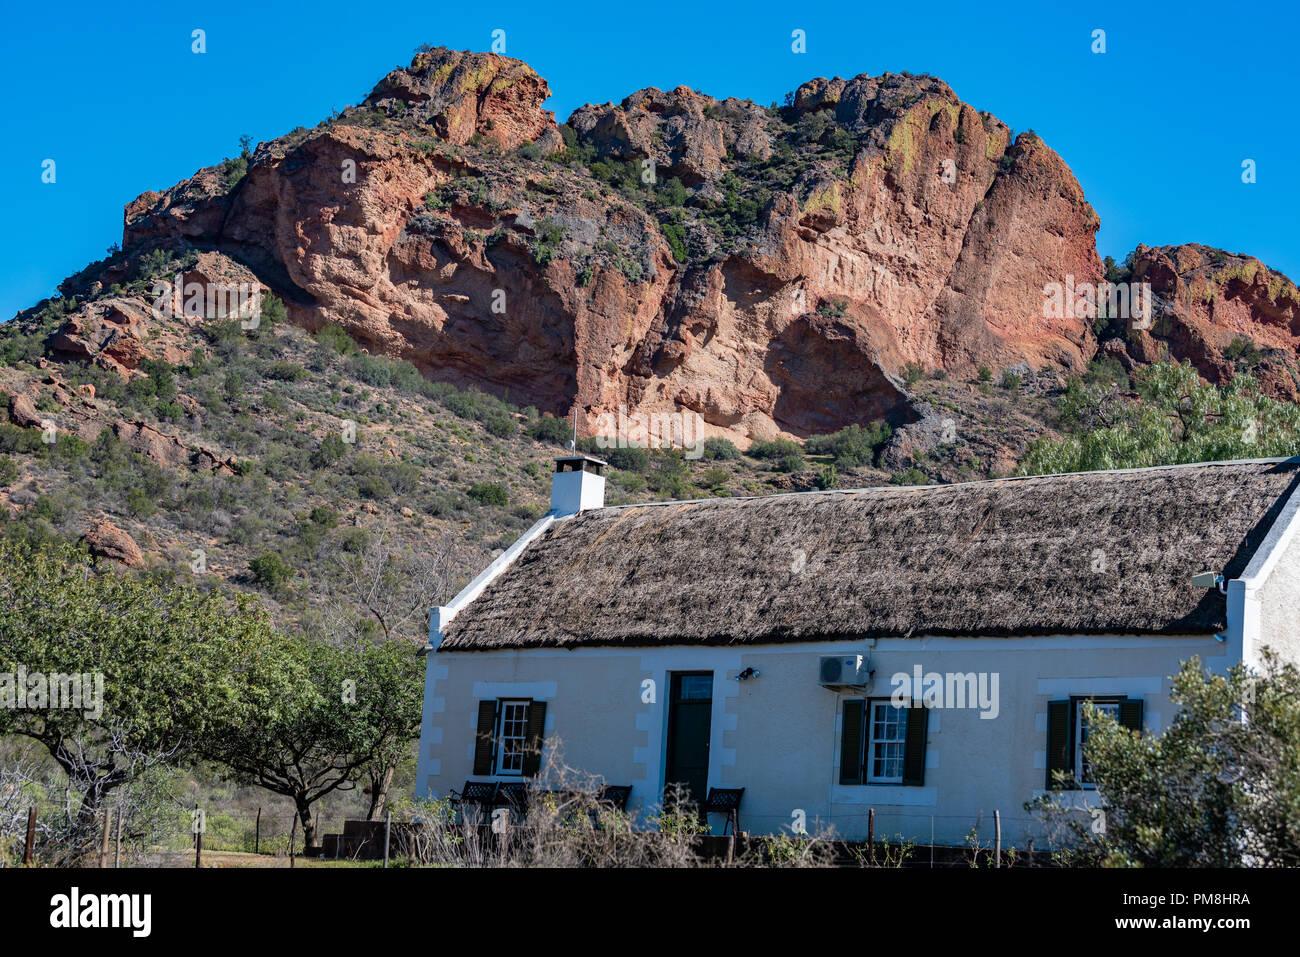 Redstone Hills, Klein Karoo, South Africa - Stock Image